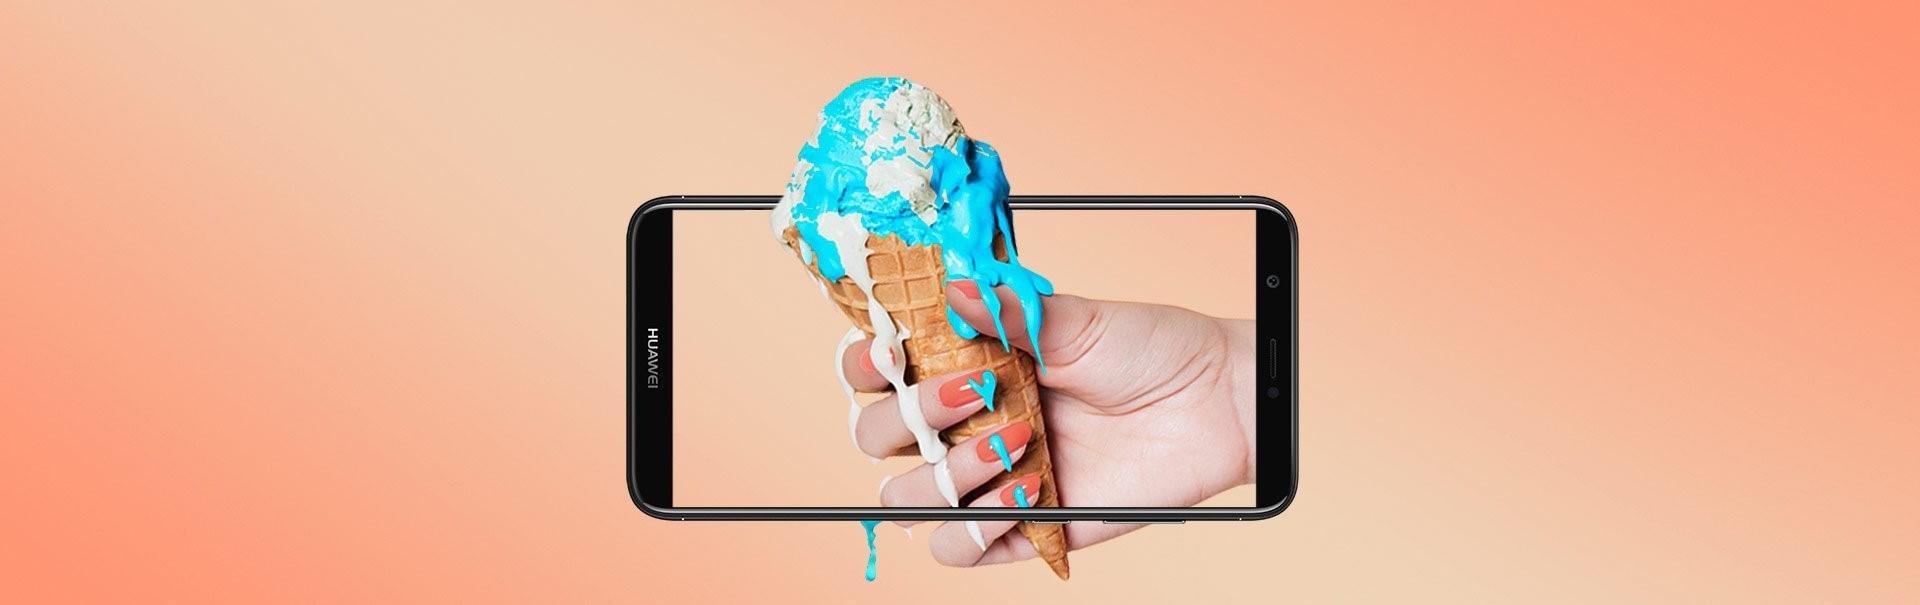 Huawei обогнала Apple по продажам смартфонов, но iPhone SE не сдаётся